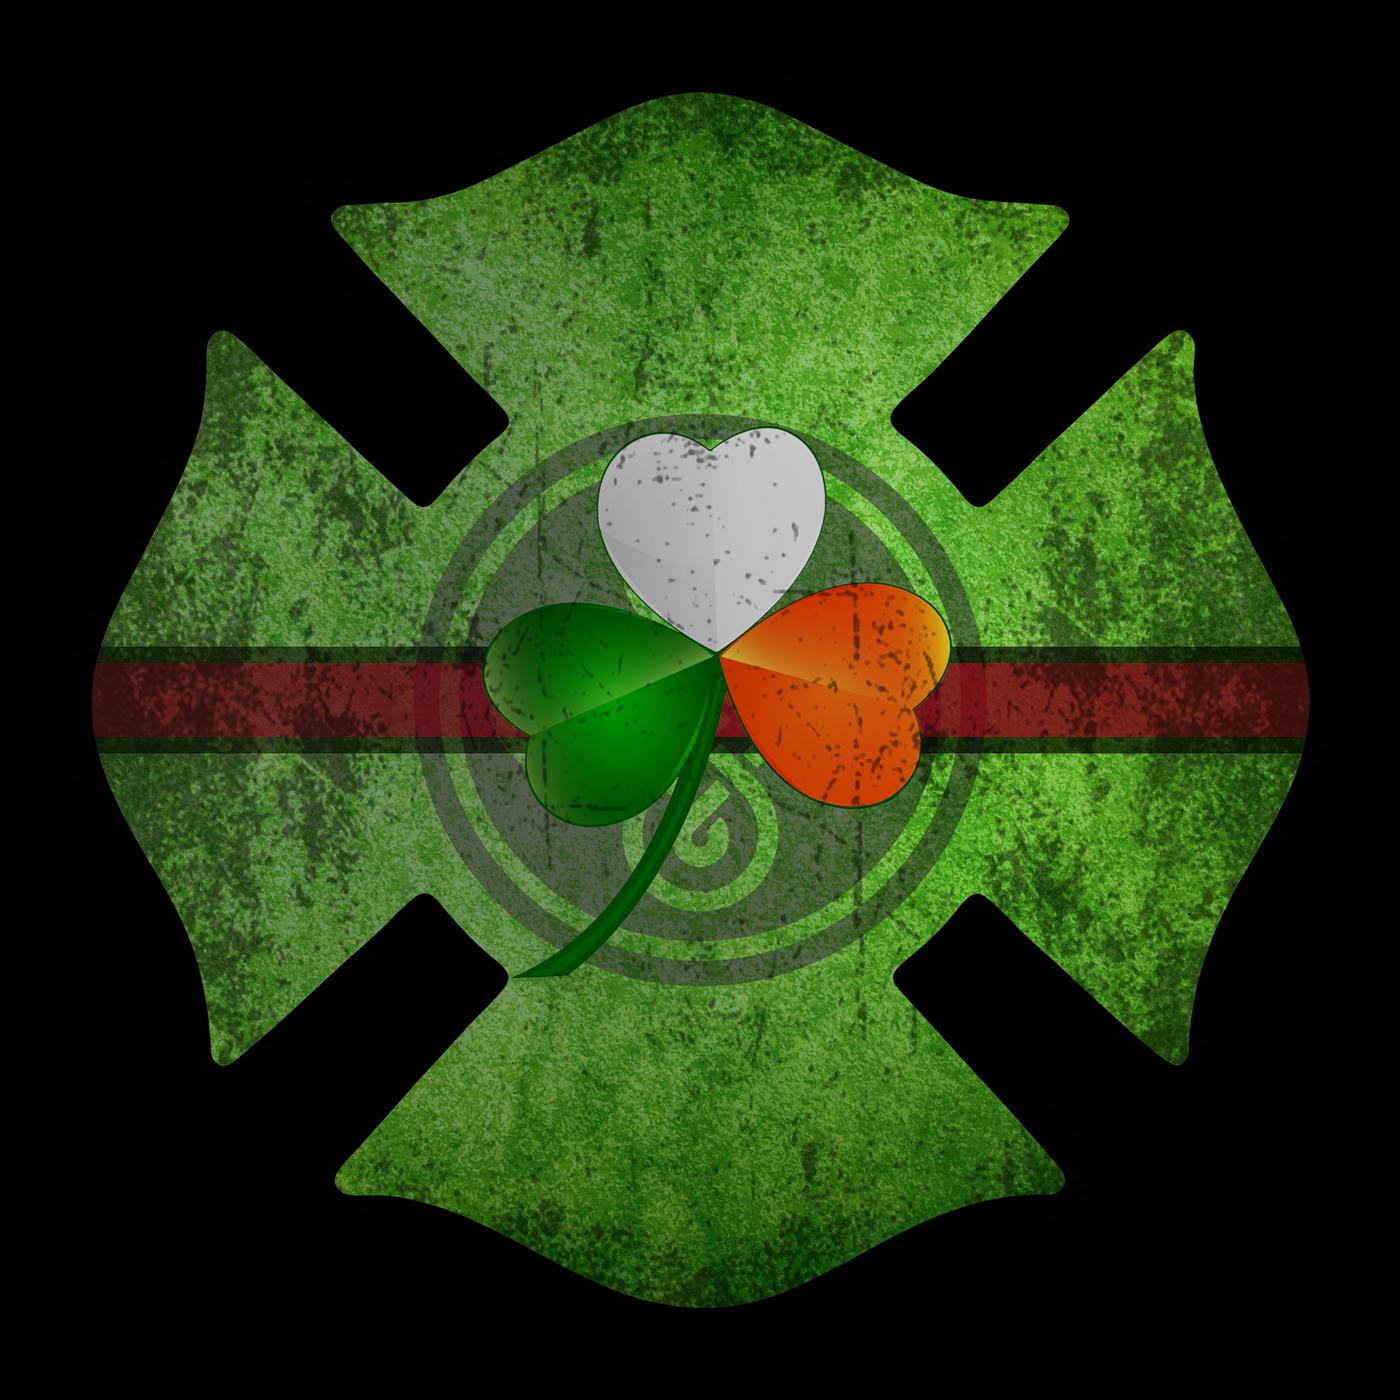 Firefighter clipart flag. Irish pre order american